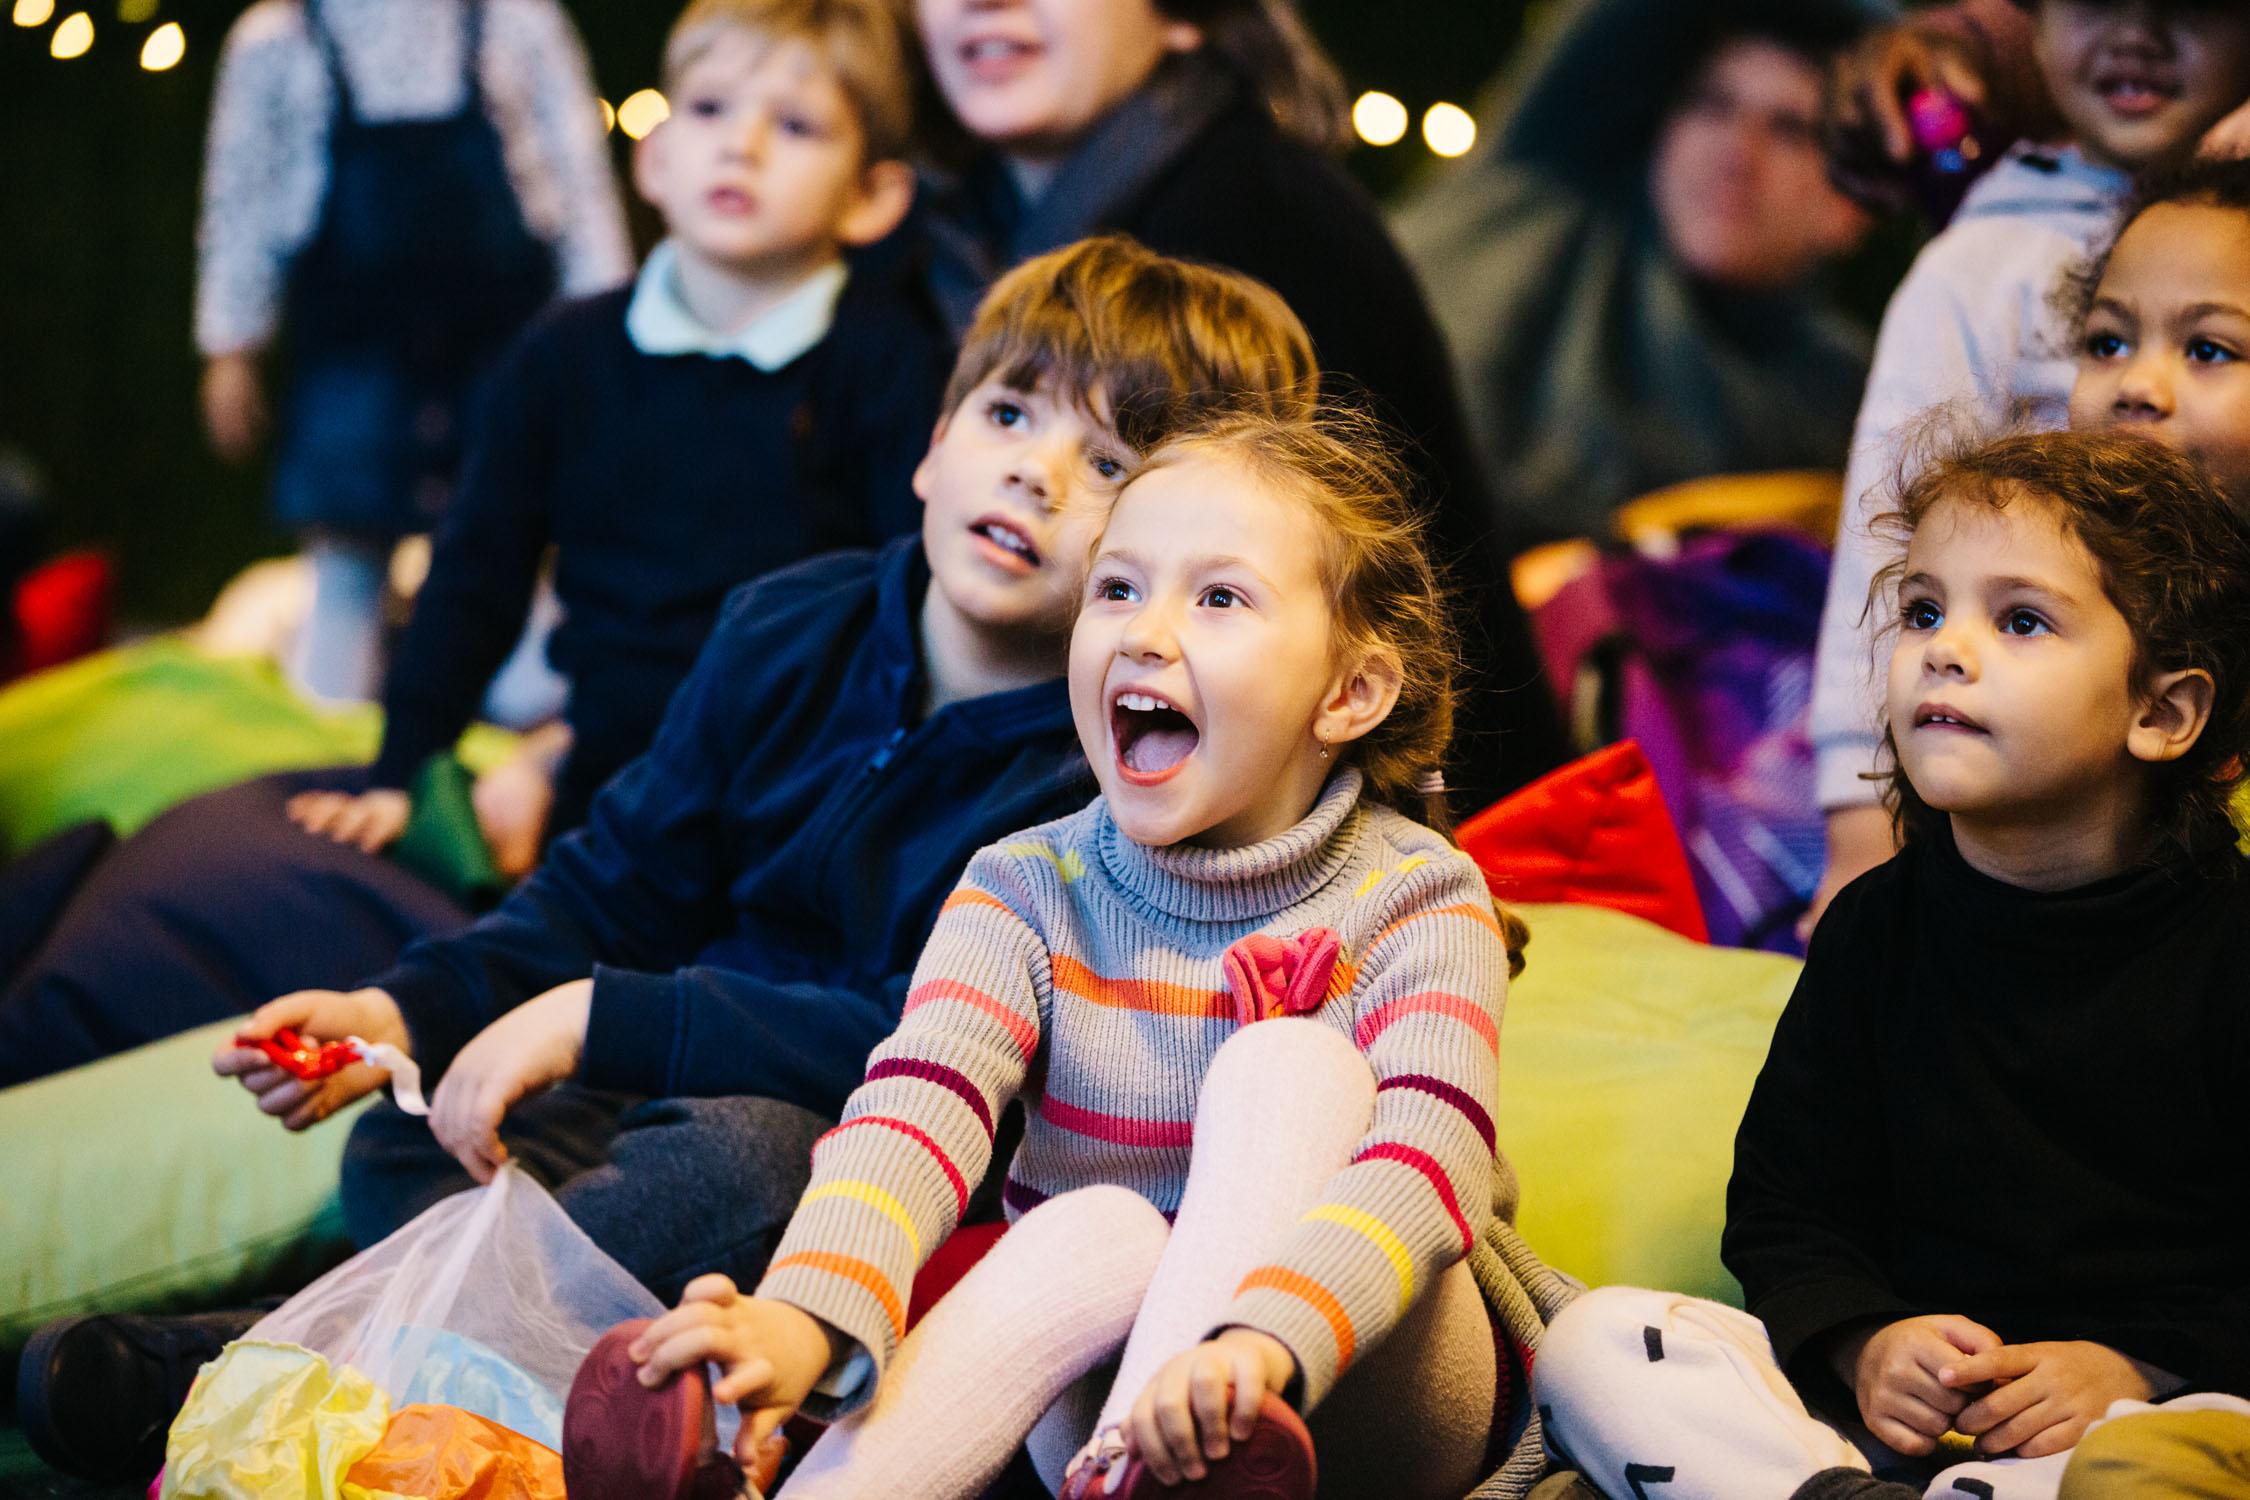 Little girl smiling watching Polka performance